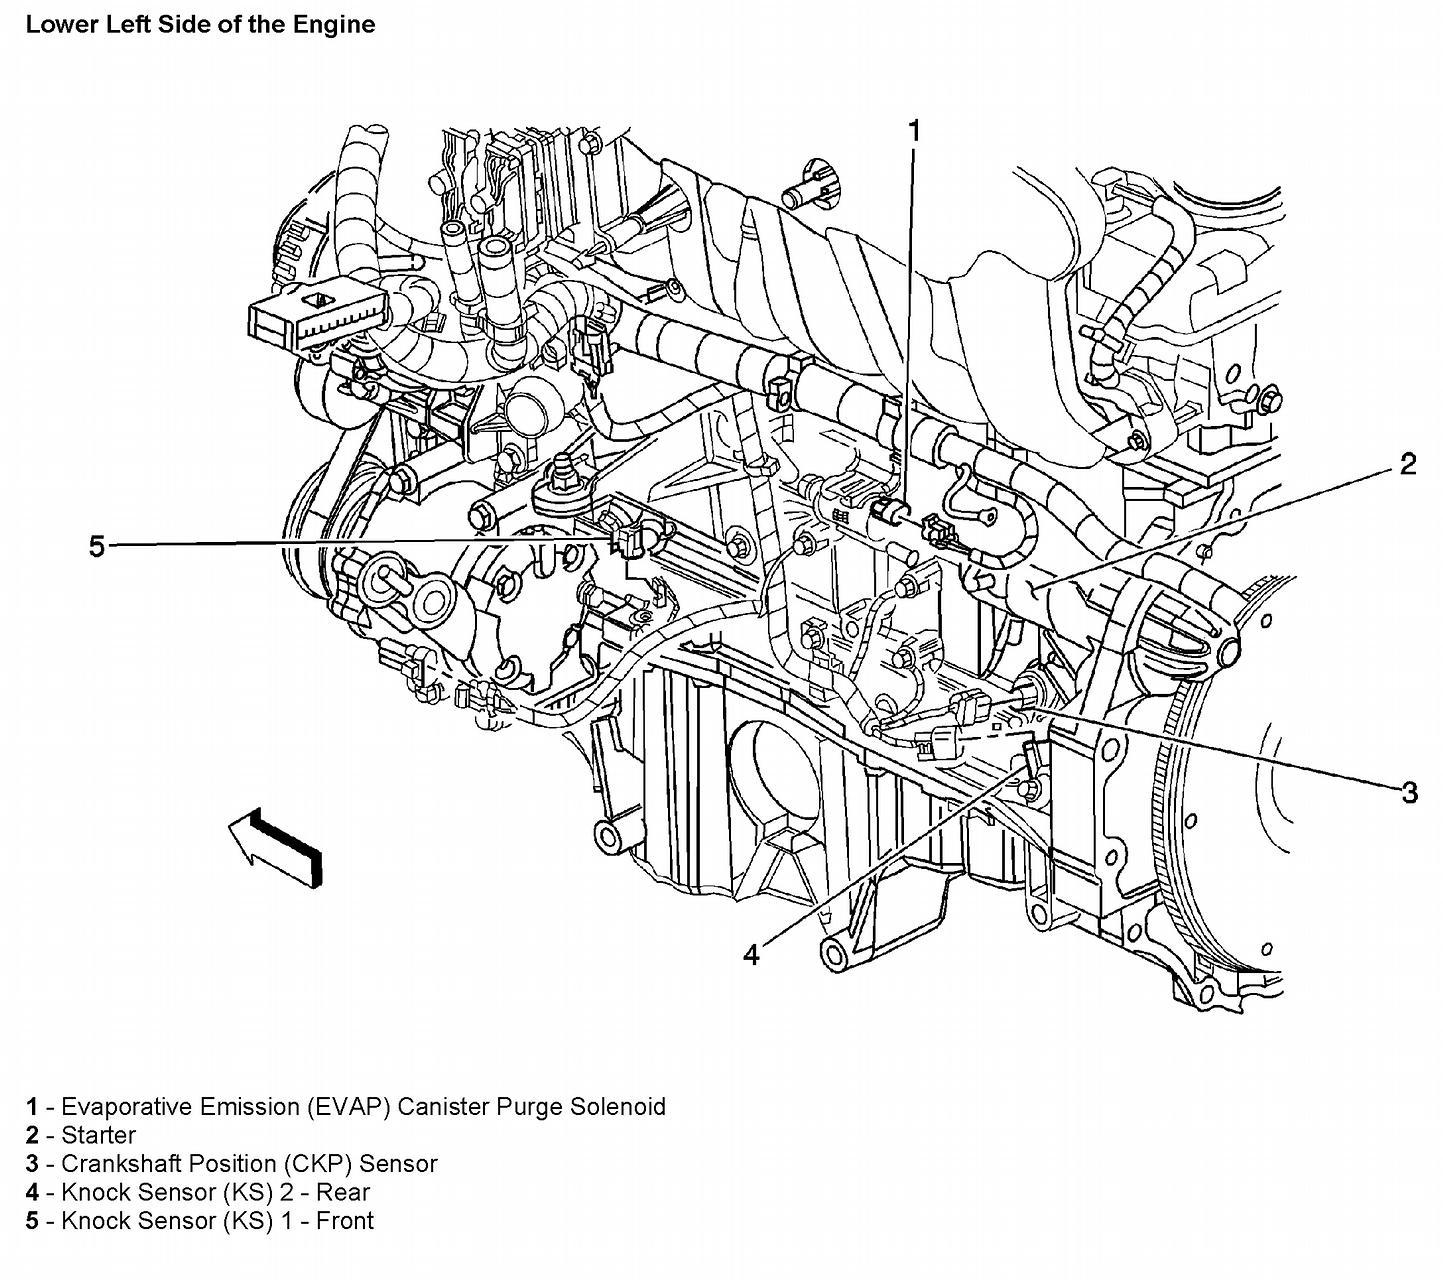 2015 Gmc Acadia Code Po496 ✓ The GMC Car